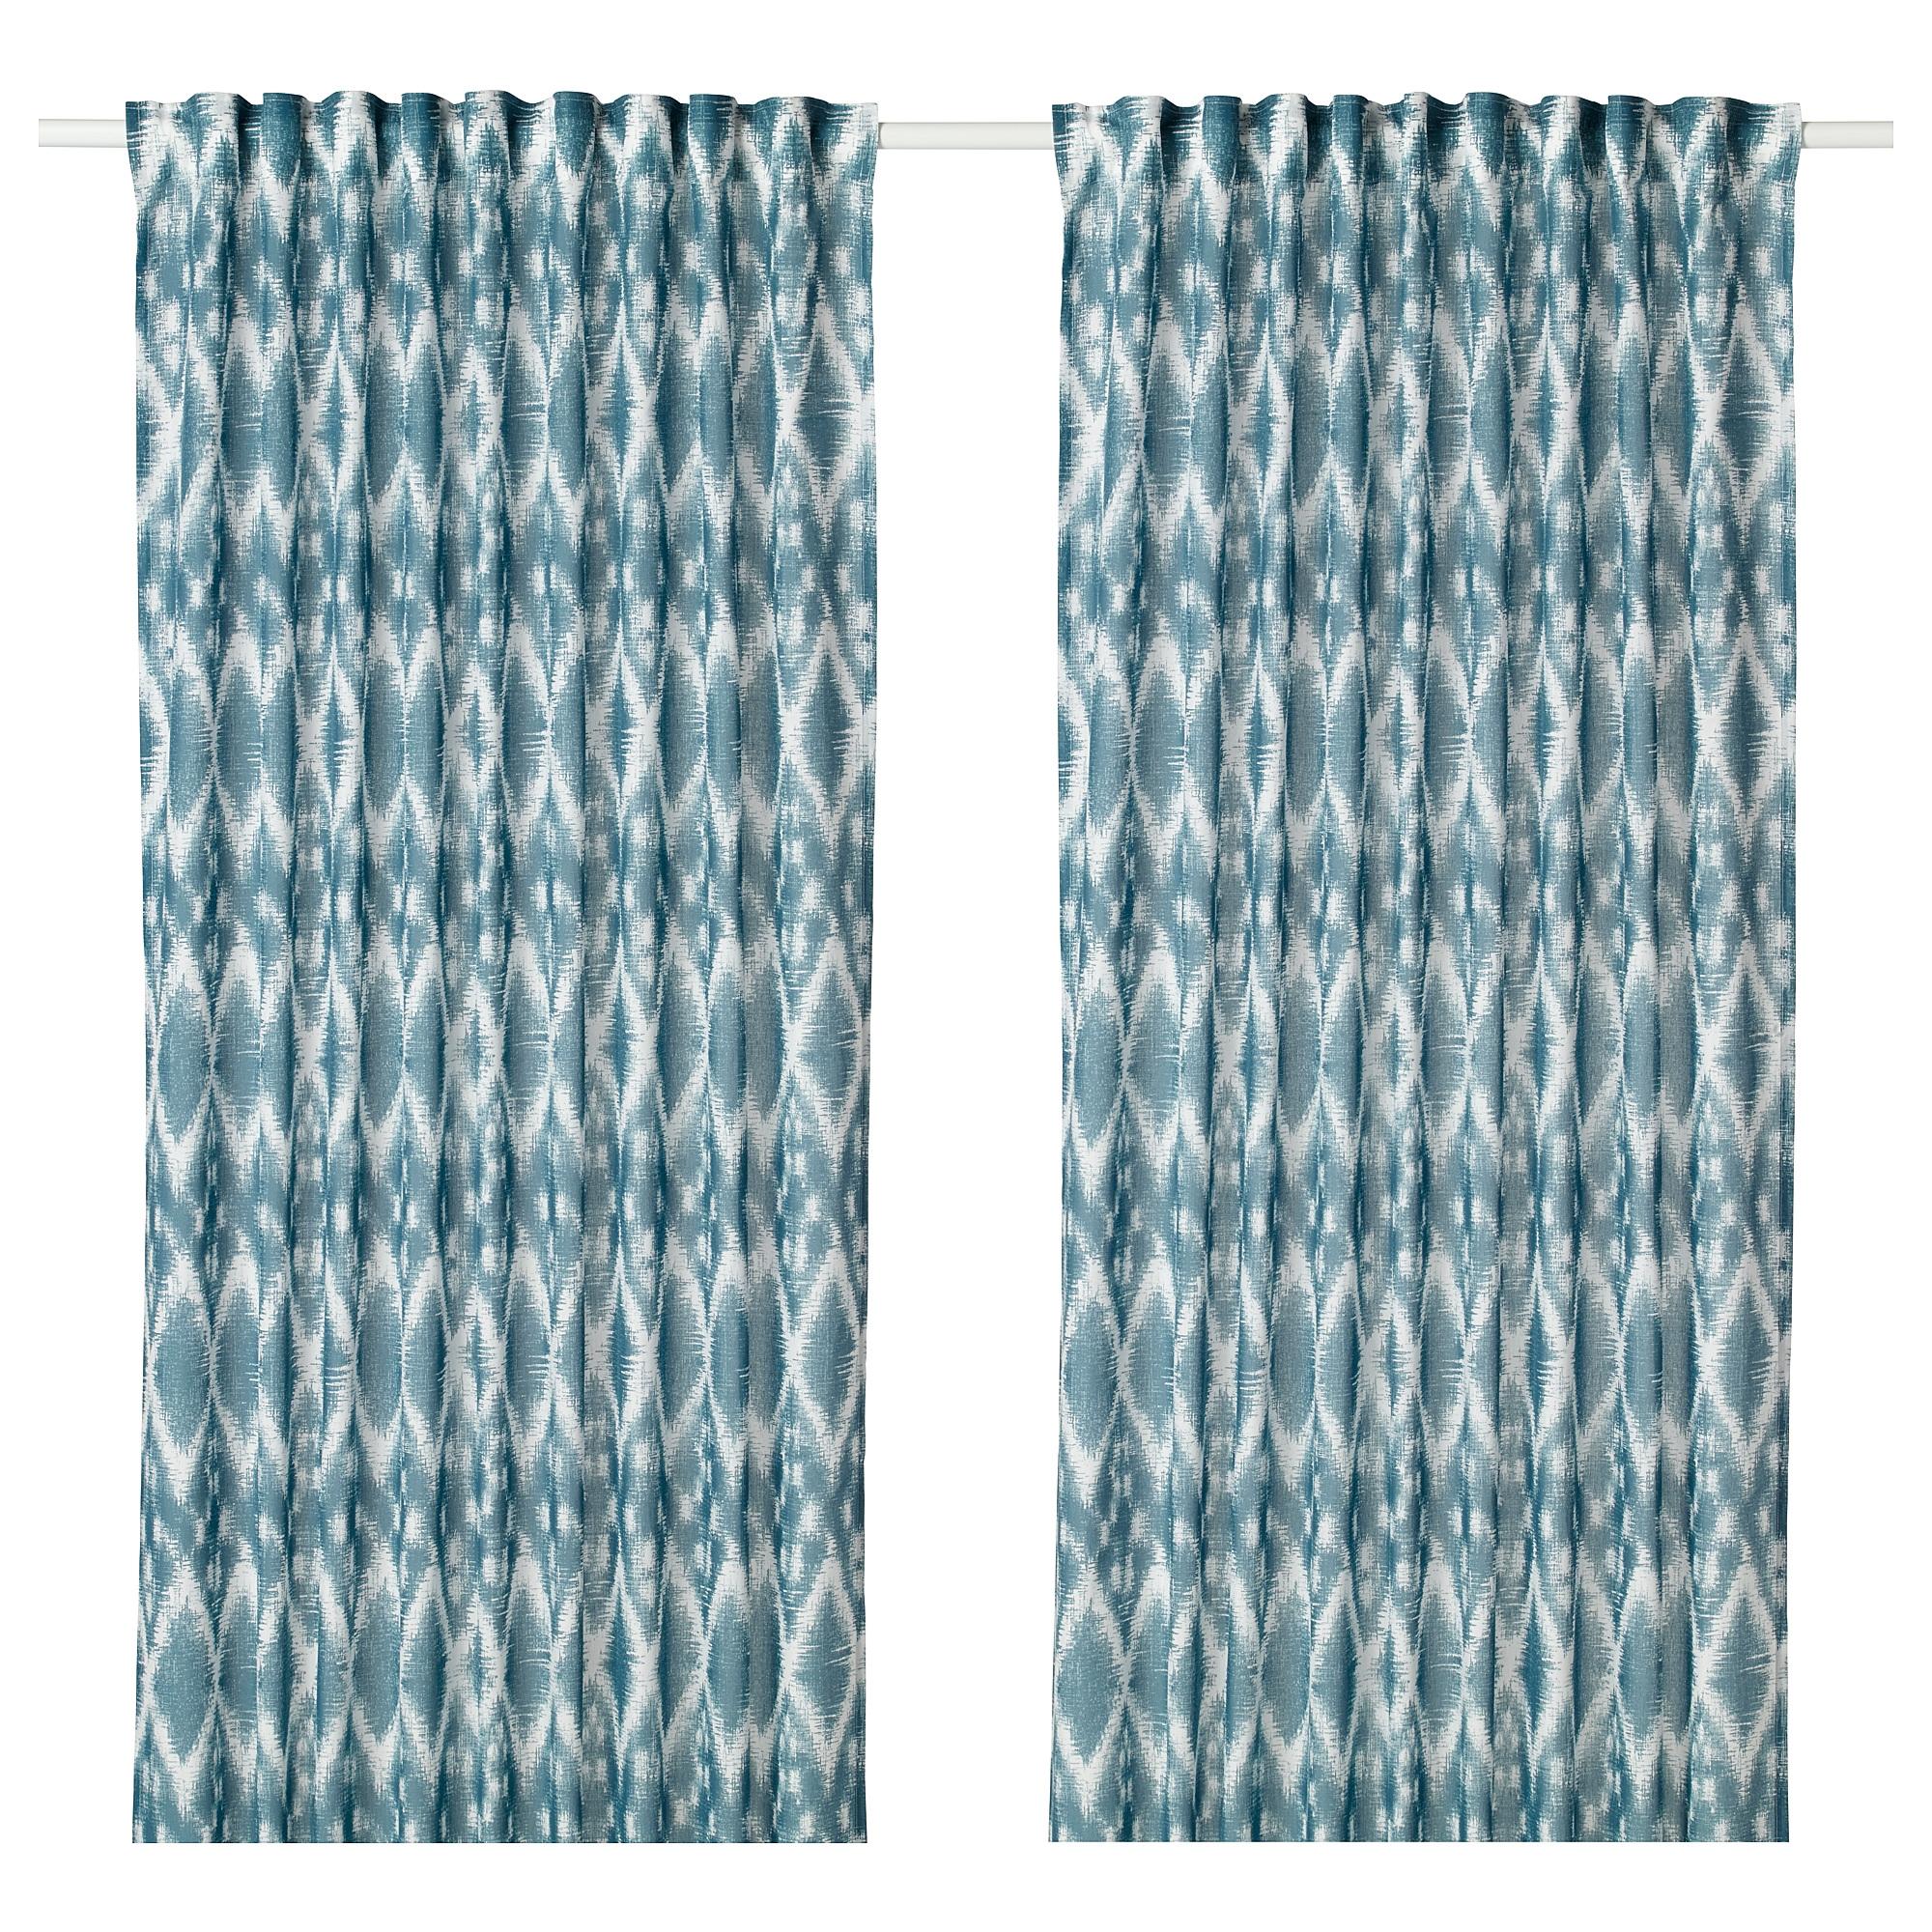 BLALILJA Curtains 1 Pair